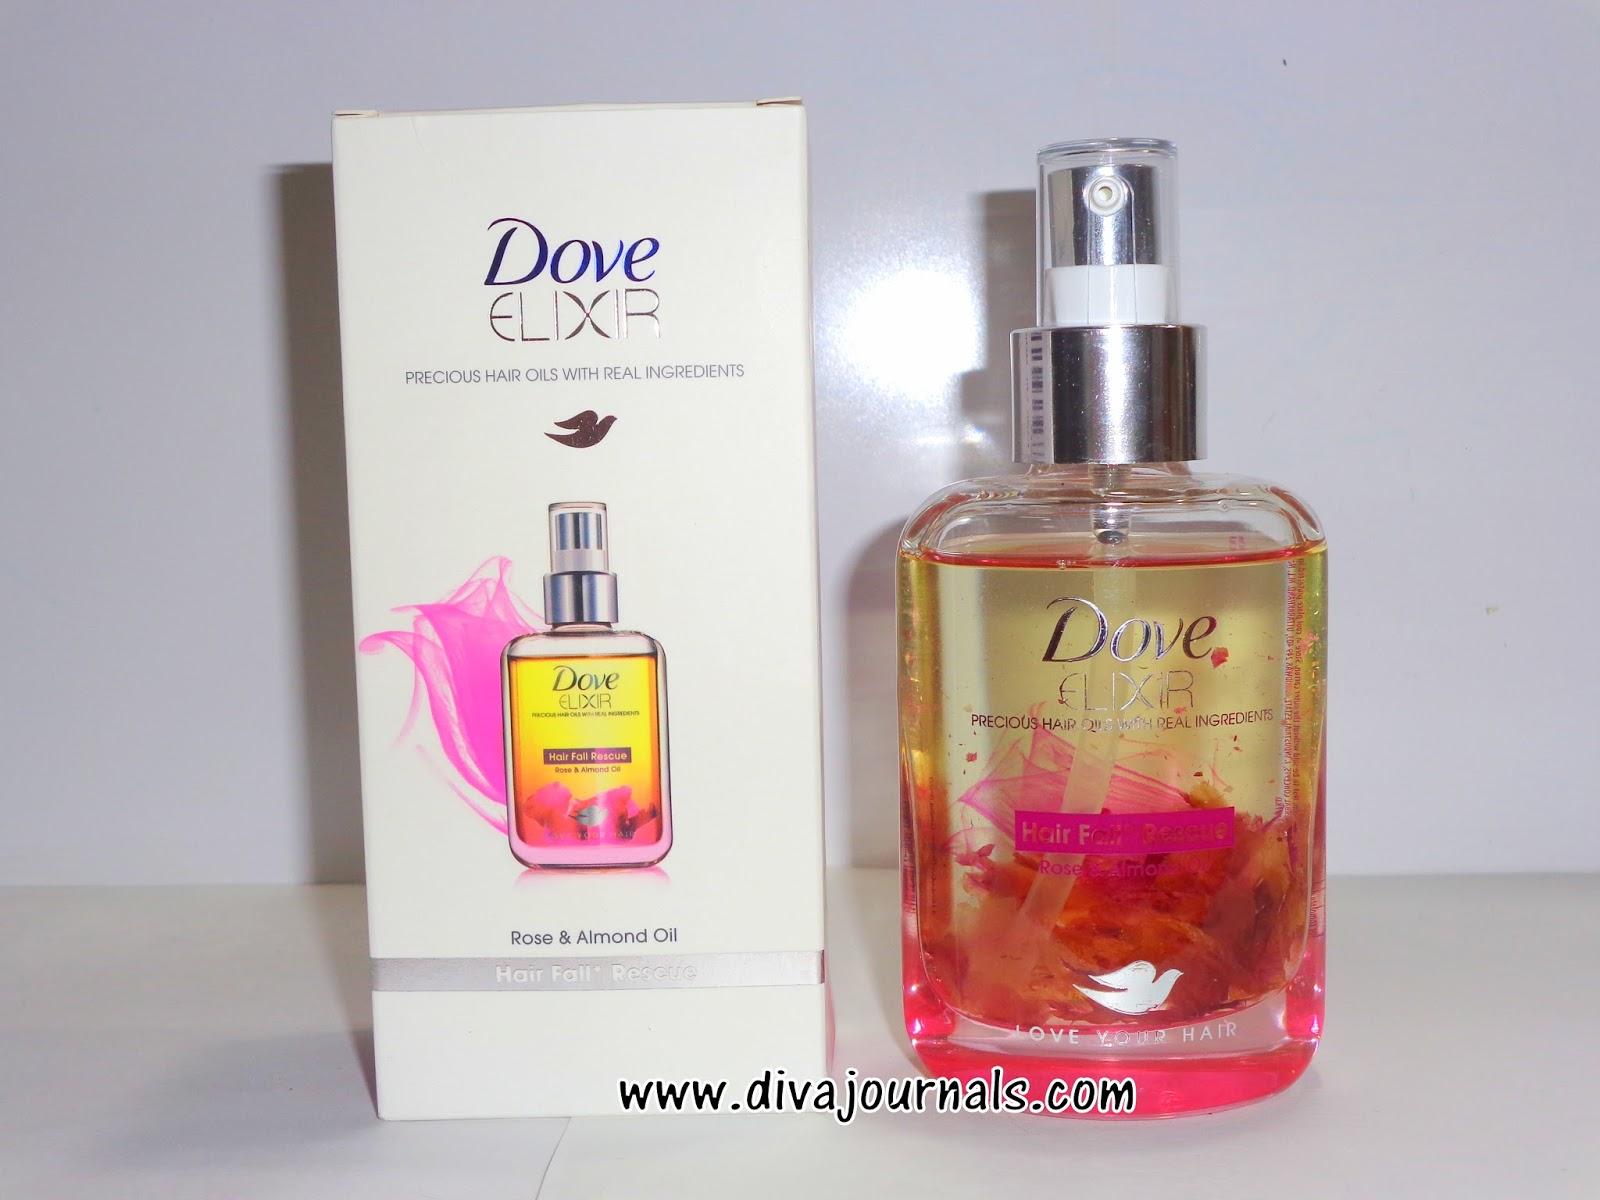 Dove Elixir Hairfall Rescue Hair Oil Review